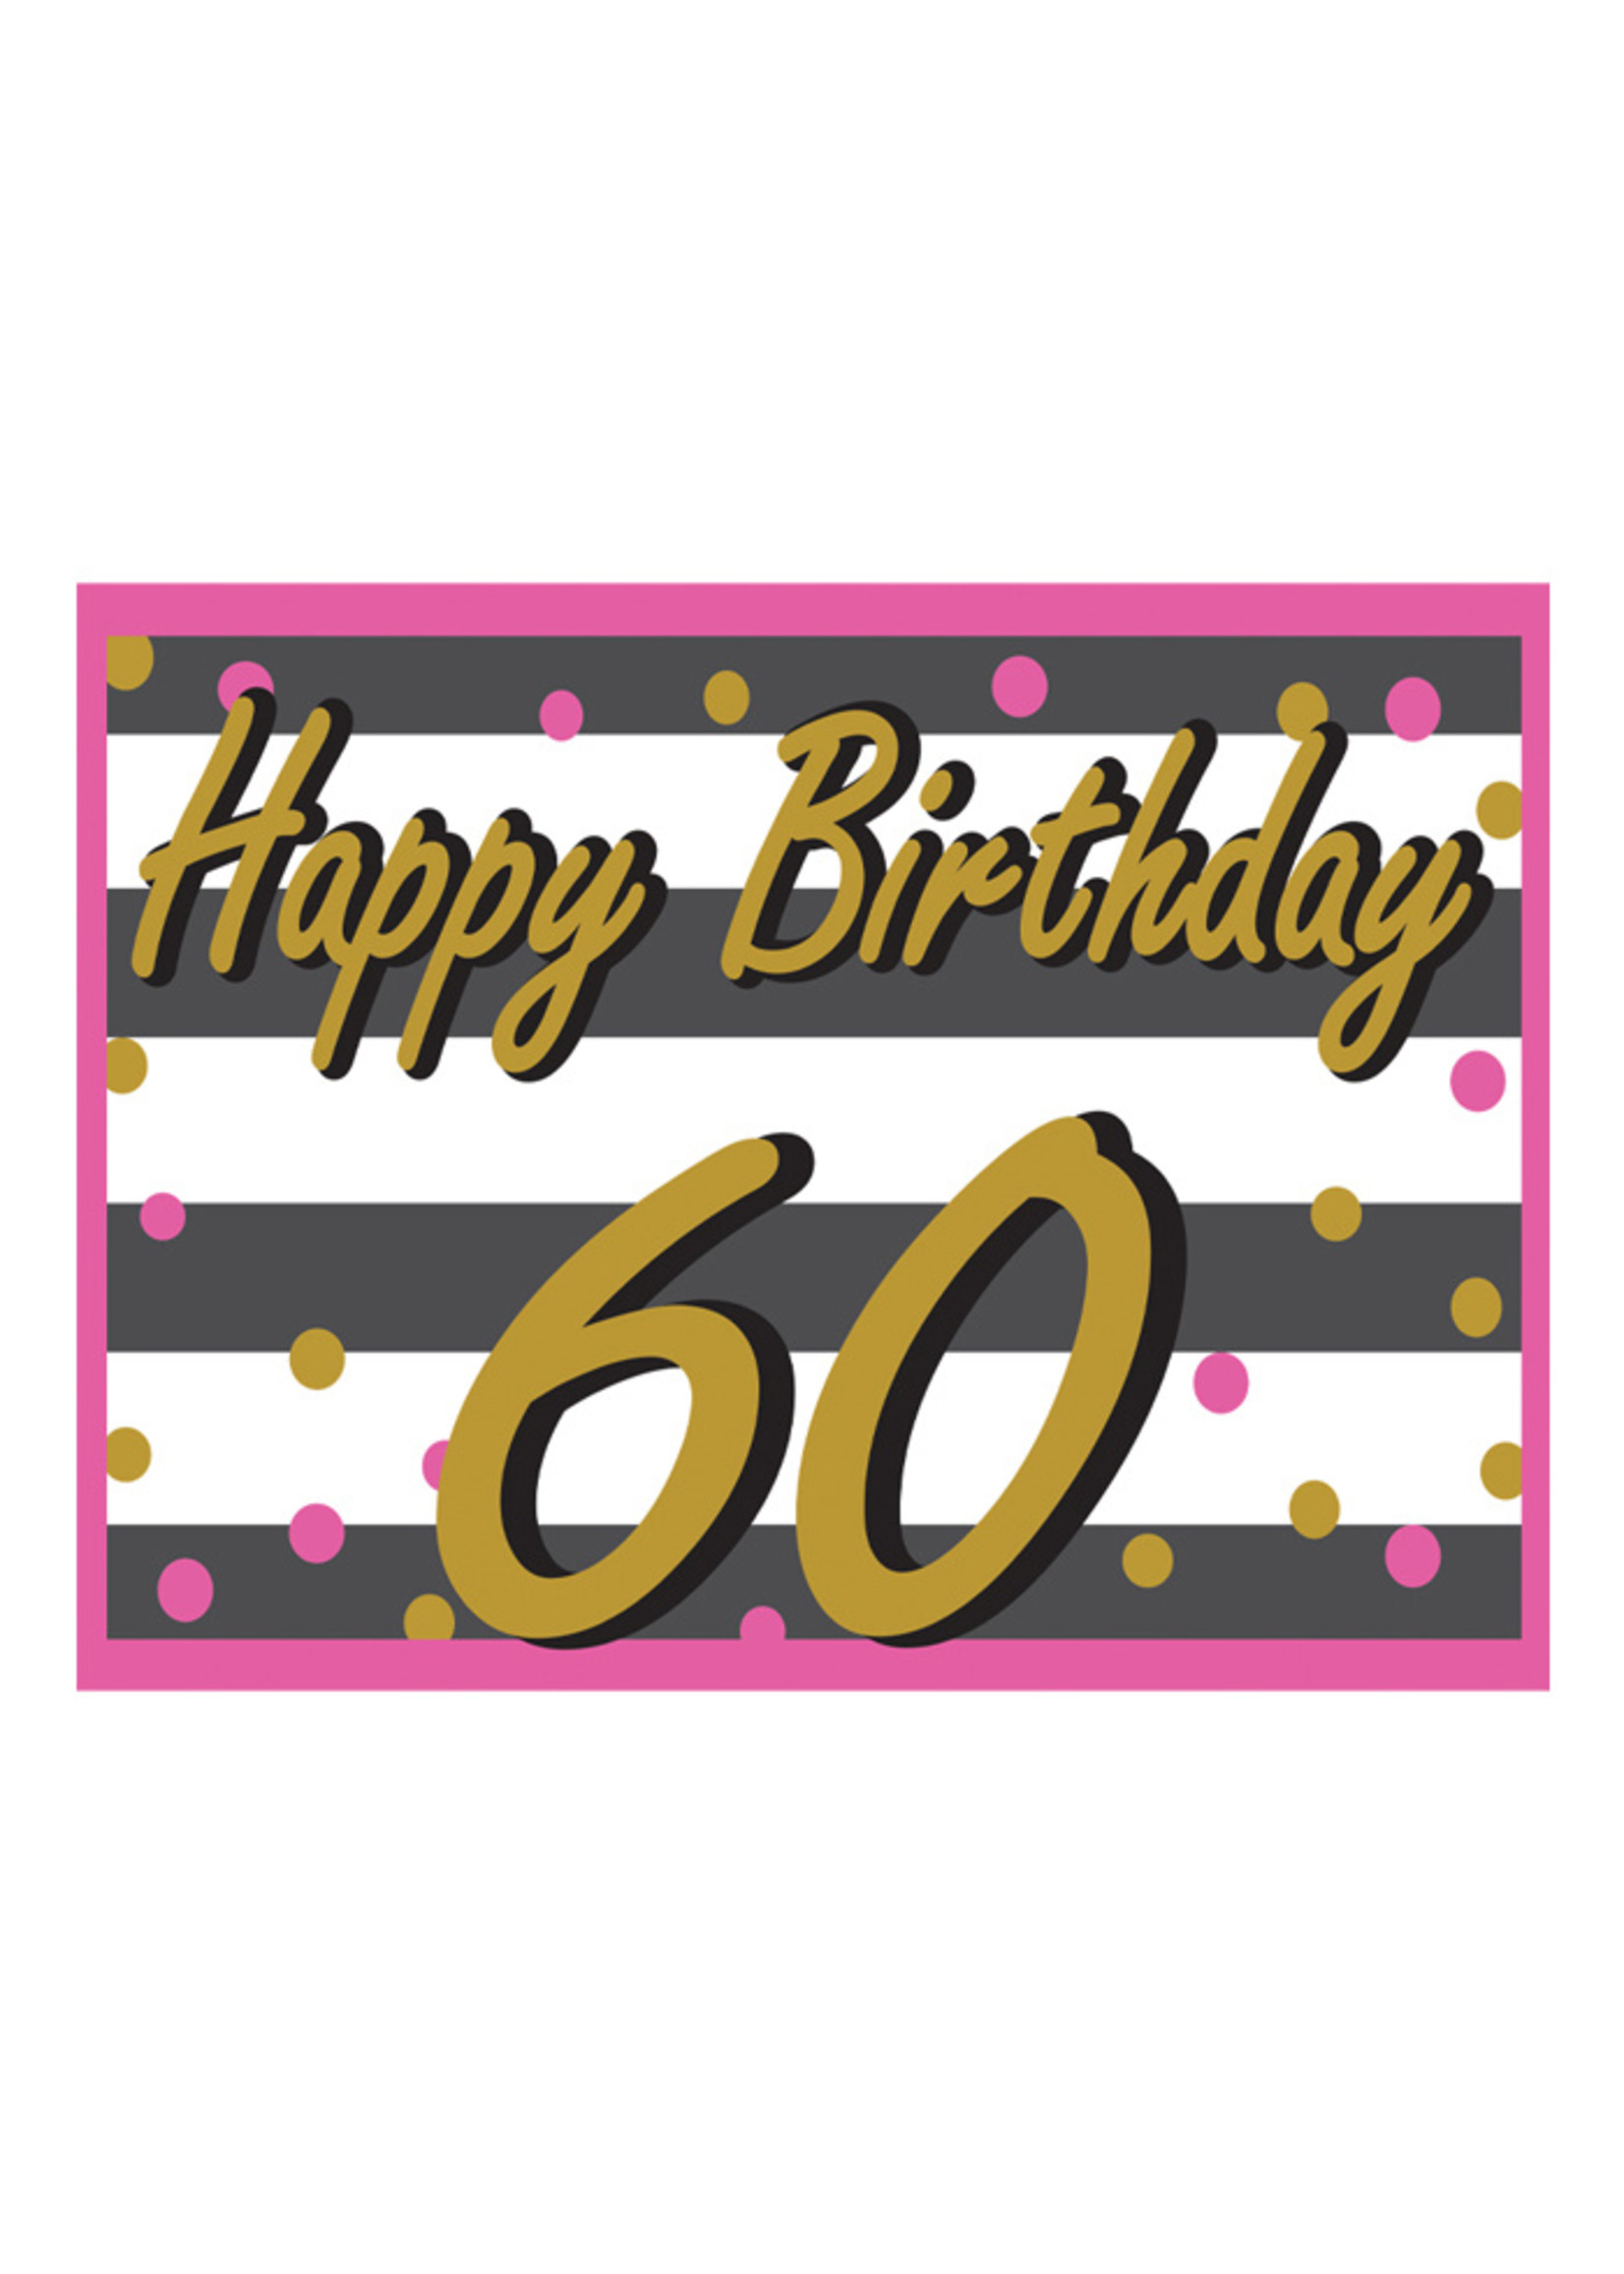 Happy Birthday 60th Pink & Gold Yard Sign